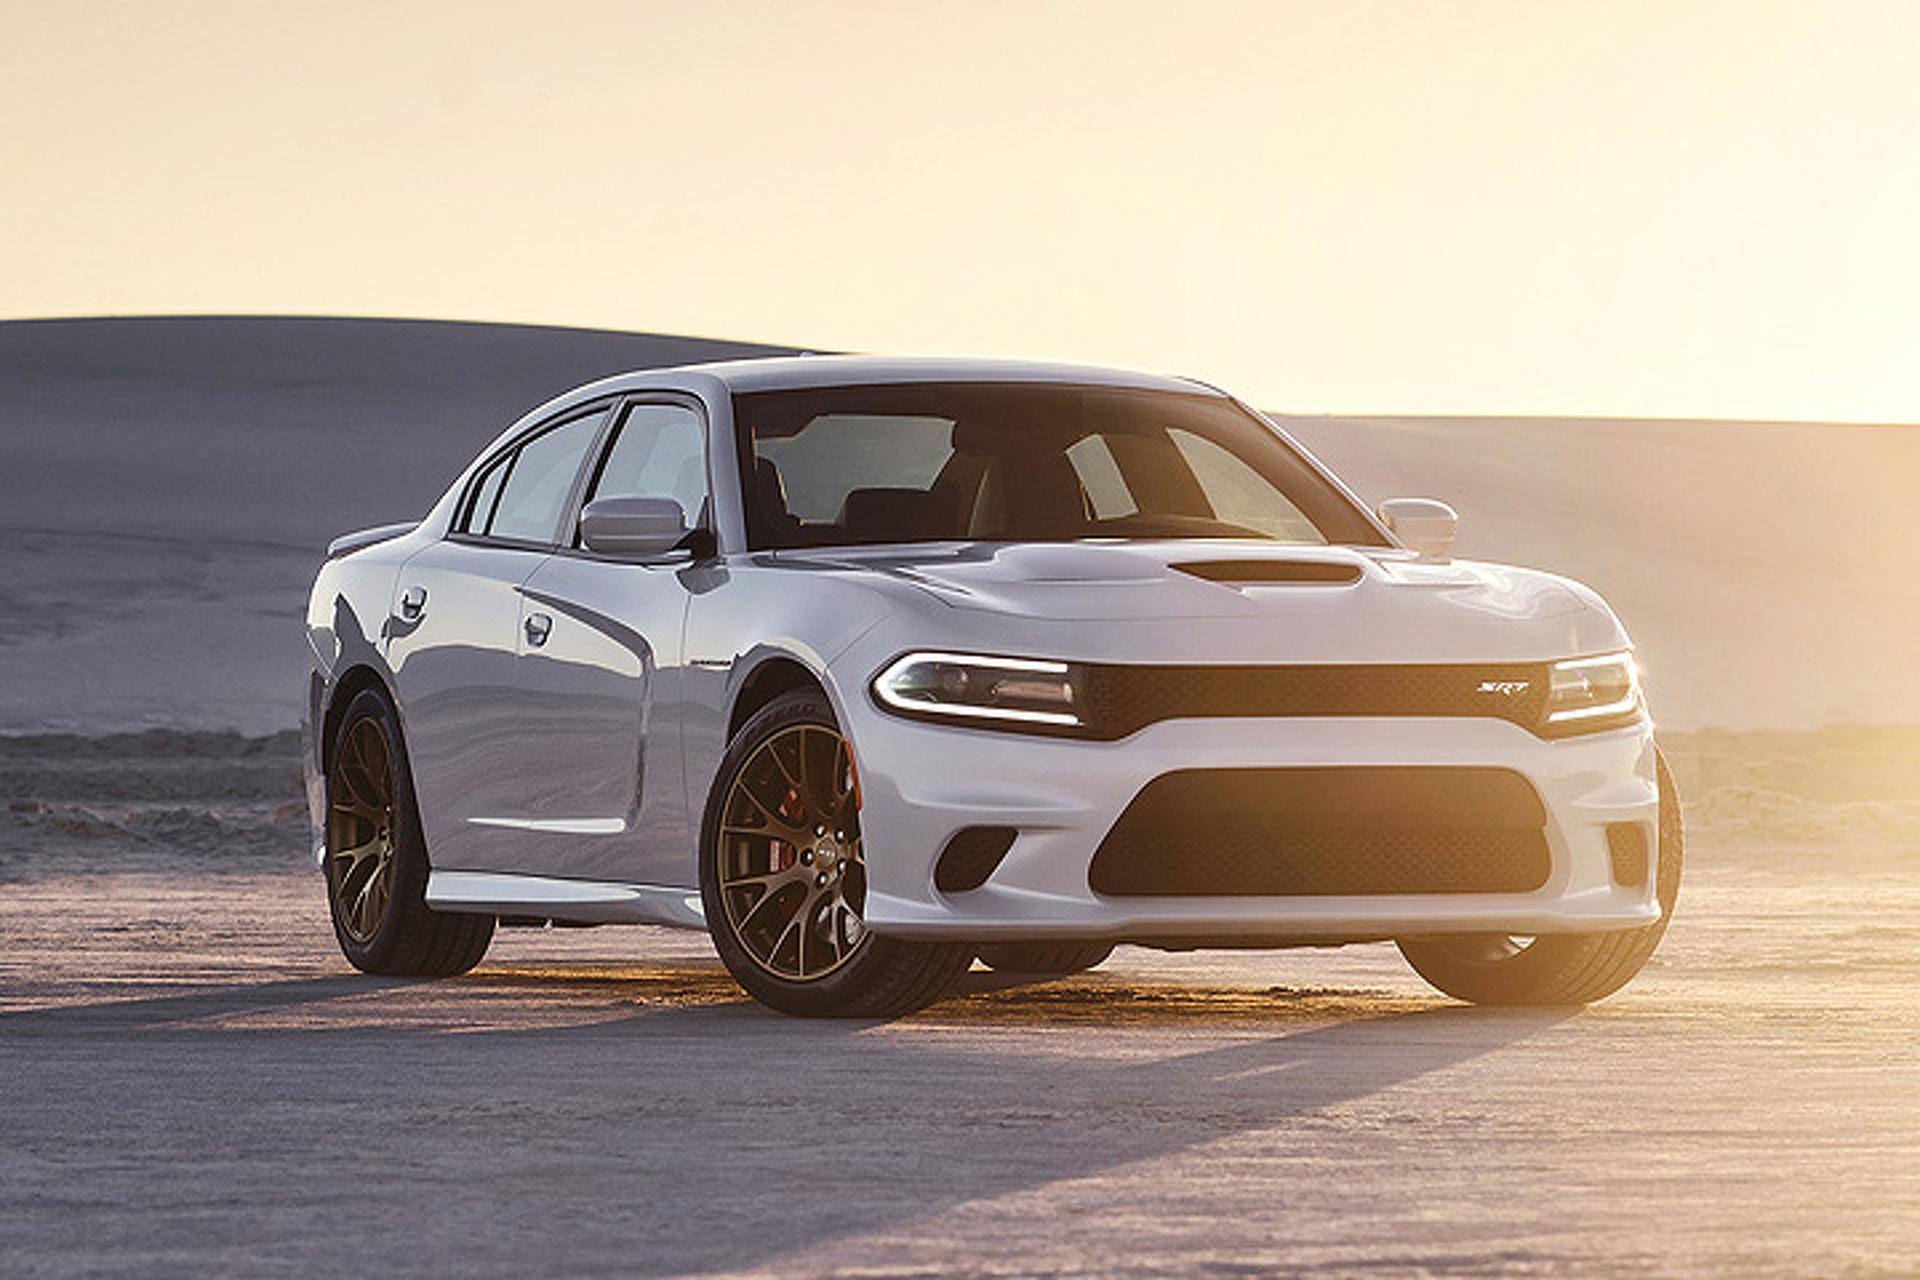 5 Fastest American Cars